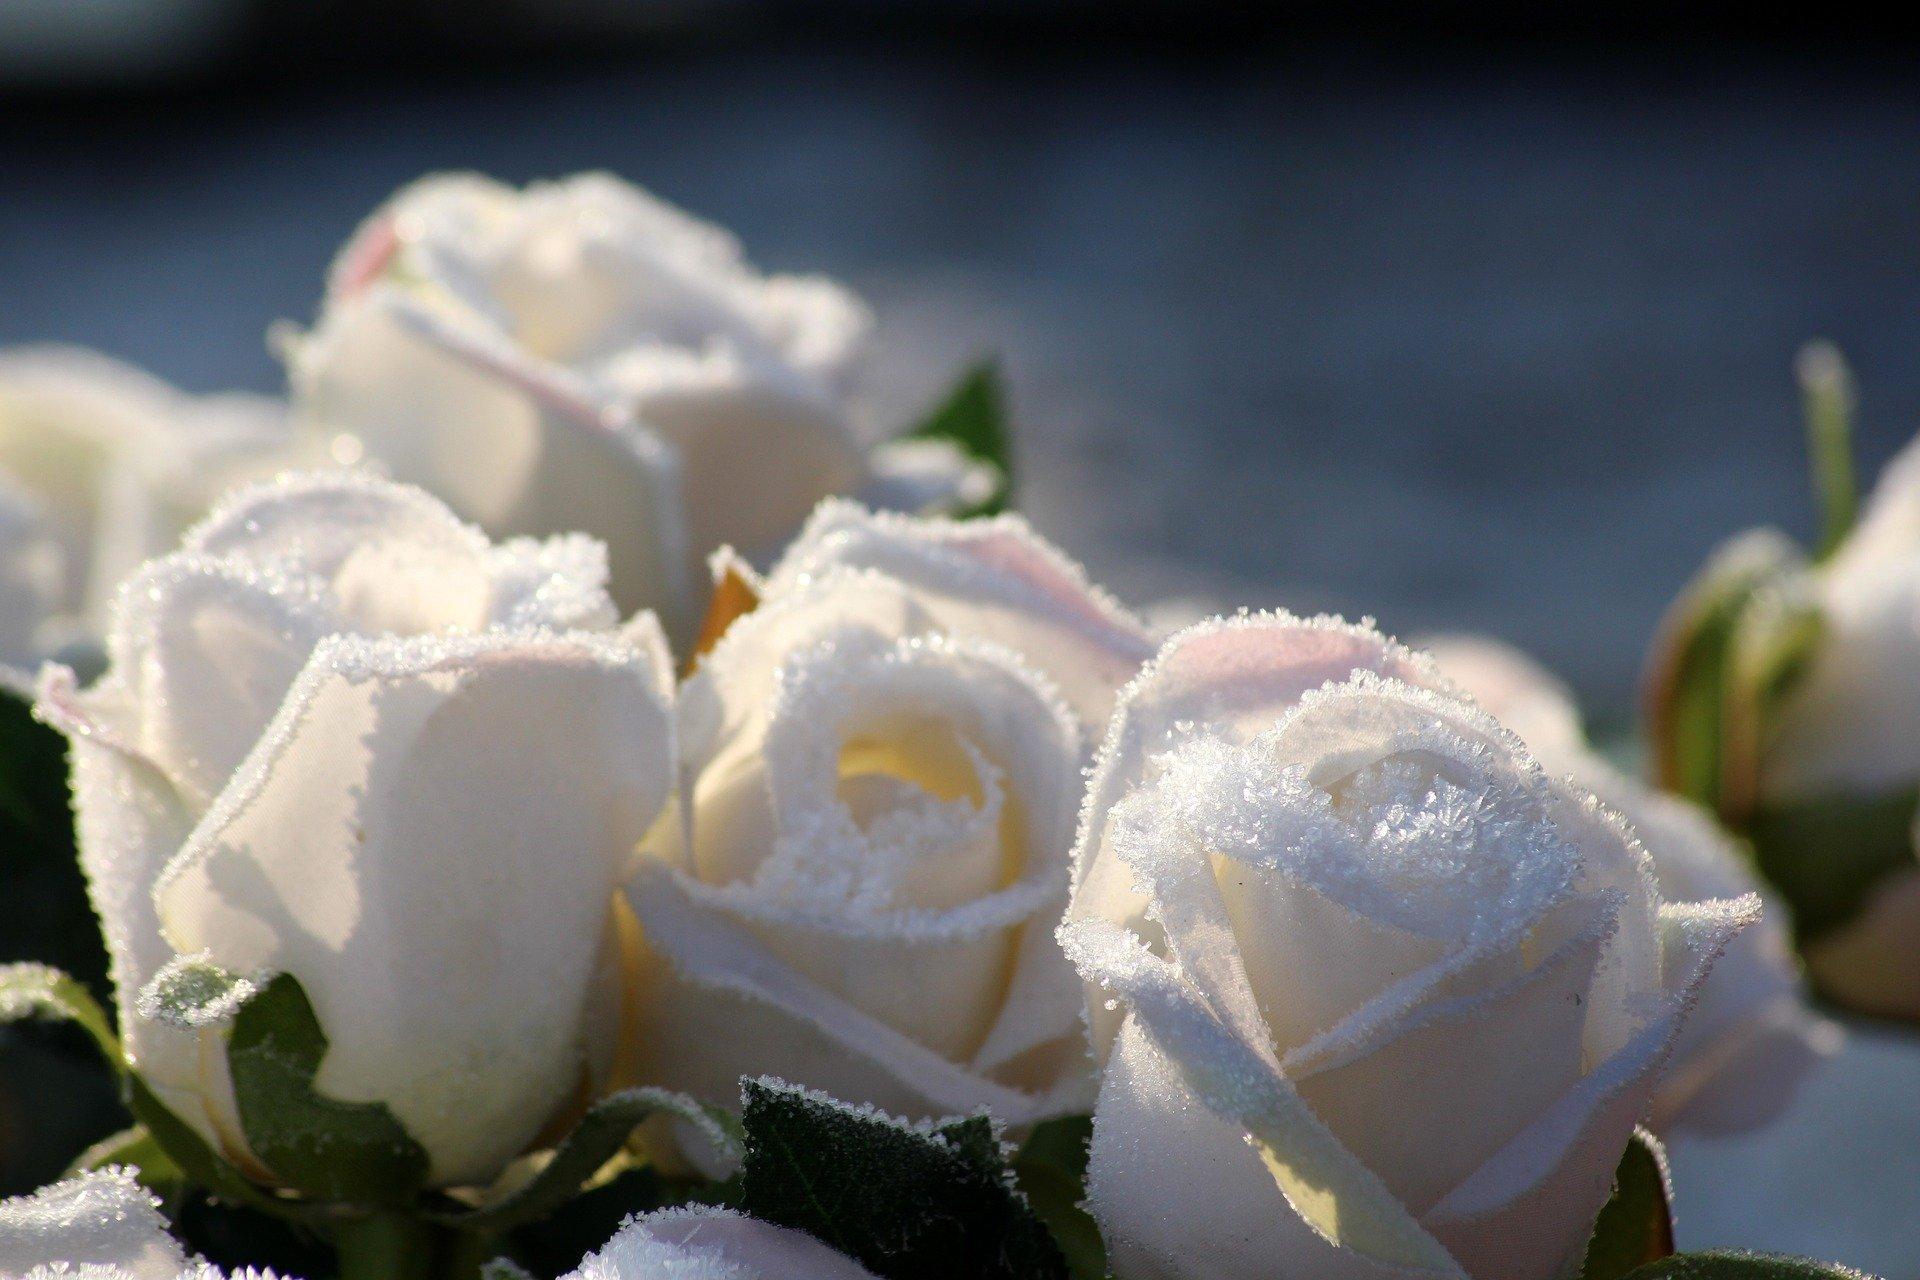 Roses 3954128 1920